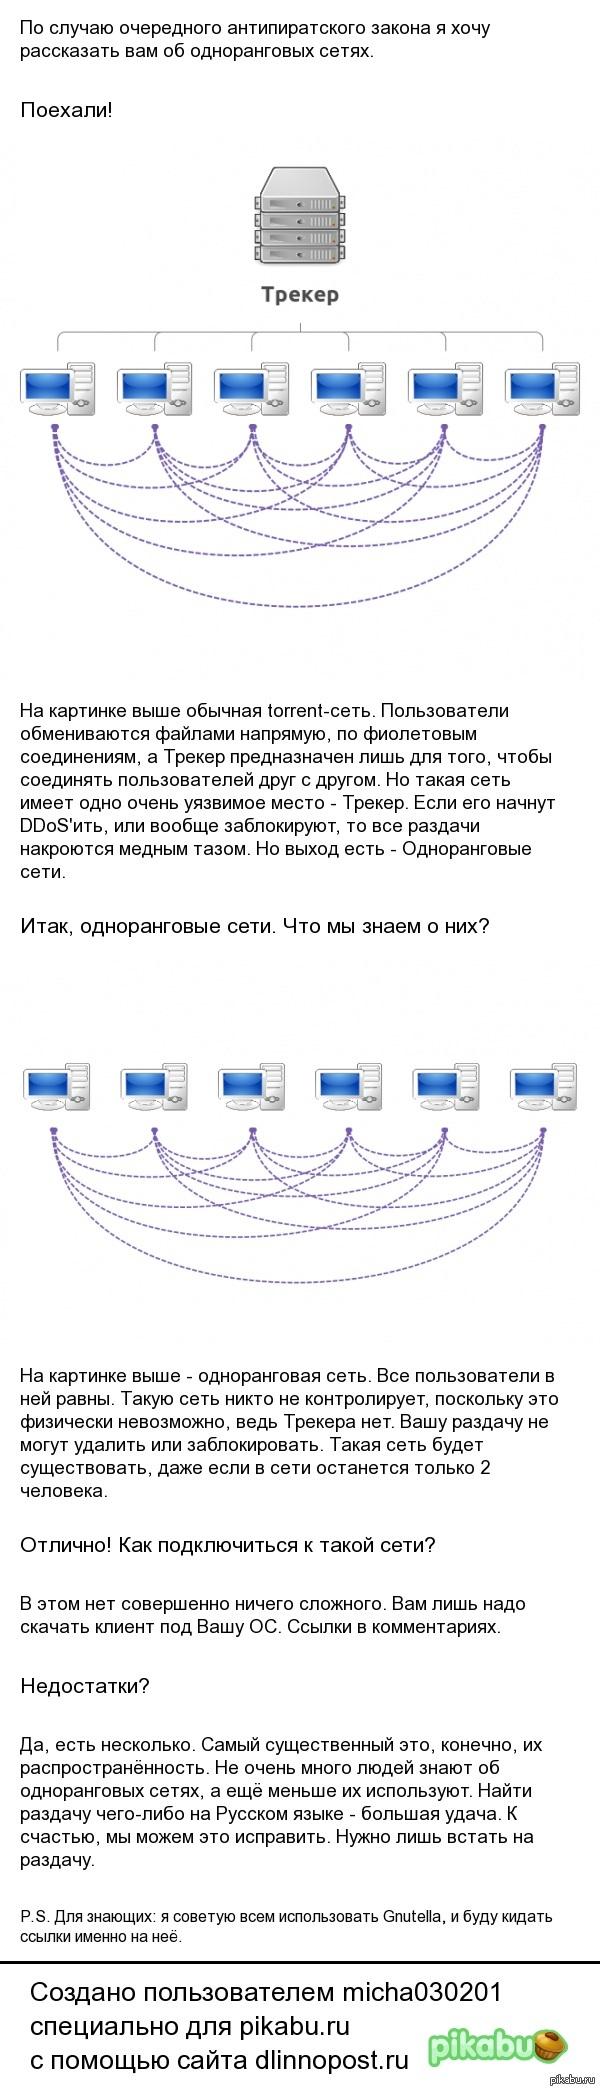 "Одноранговые сети Навеяно - <a href=""http://shop-archive.ru/away/pikabu.ru/story/gryadut_mediarepressii_2821086"">http://shop-archive.ru/away/pikabu.ru/story/_2821086</a>"